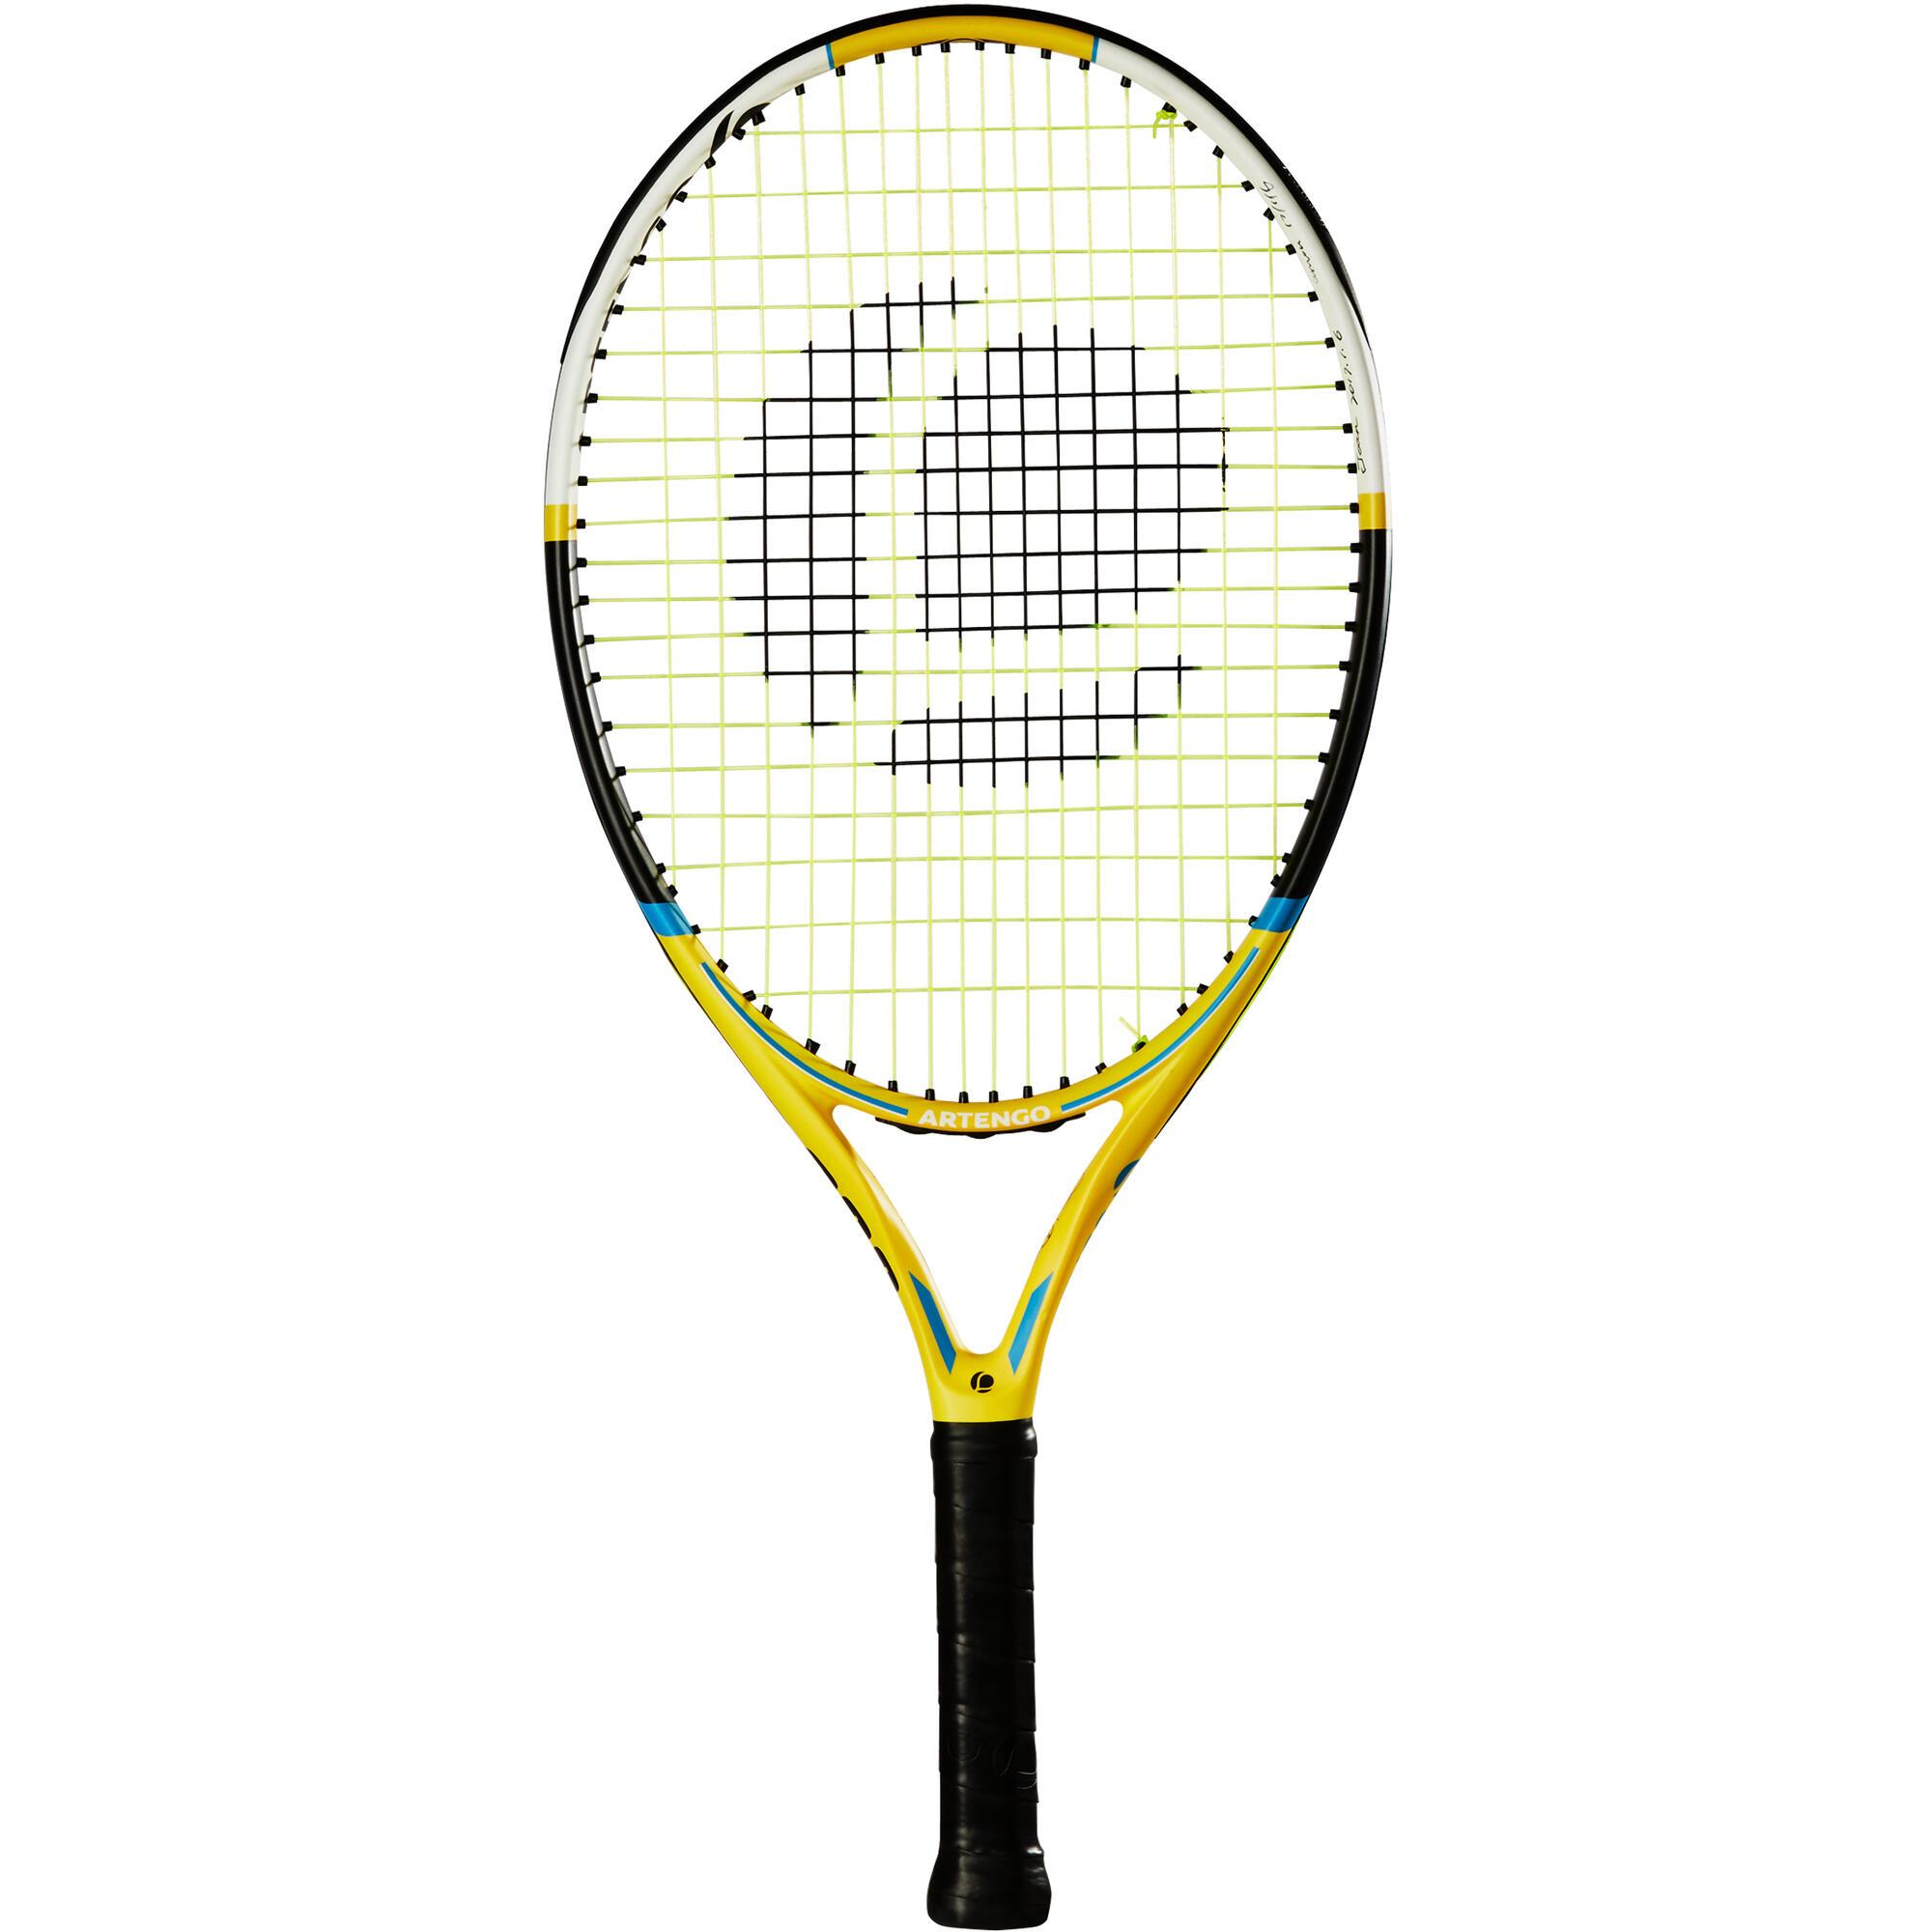 Raquette de tennis enfant tr530 23 jaune artengo - Raquette de tennis de table decathlon ...